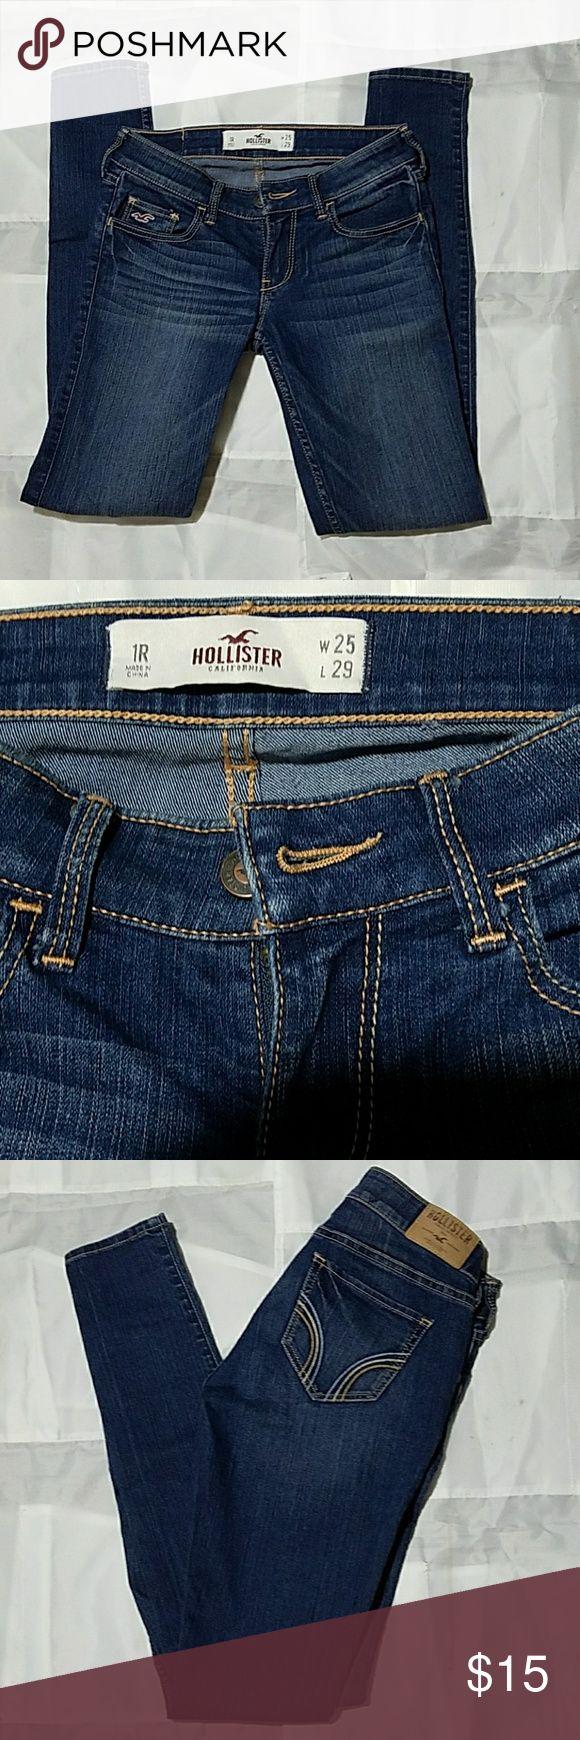 Hollister jeans size 25/1R skinny Hollister skinny jeans size 25/1R Hollister Jeans Skinny